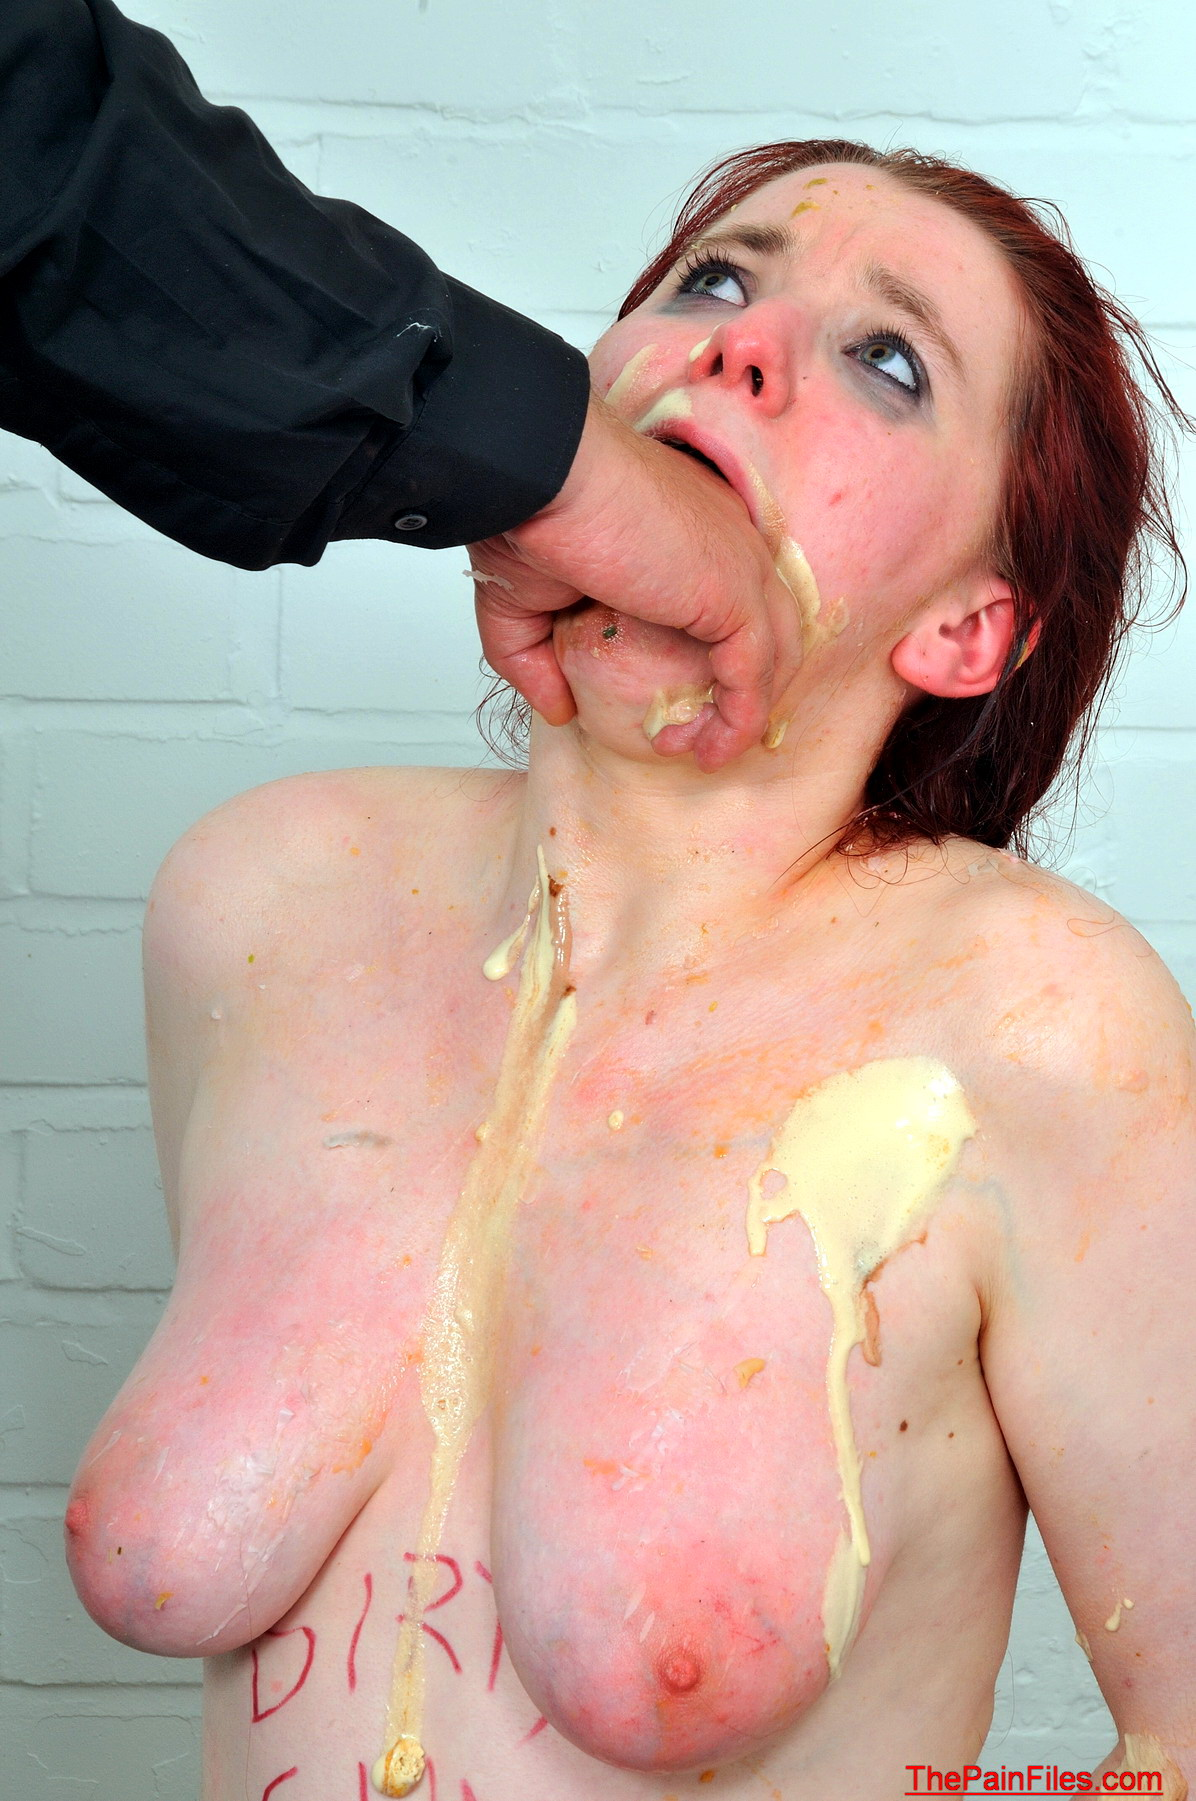 Humiliation girl